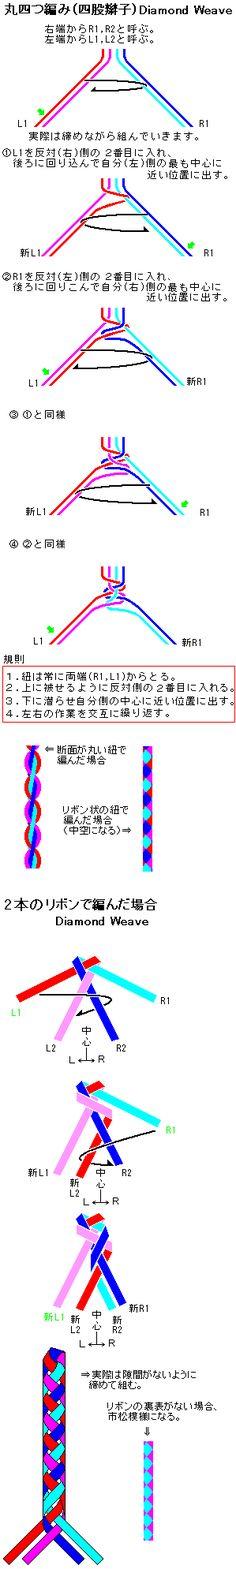 knots-丸打ち四つ編み(四股辮子)Diamond Weave.gif